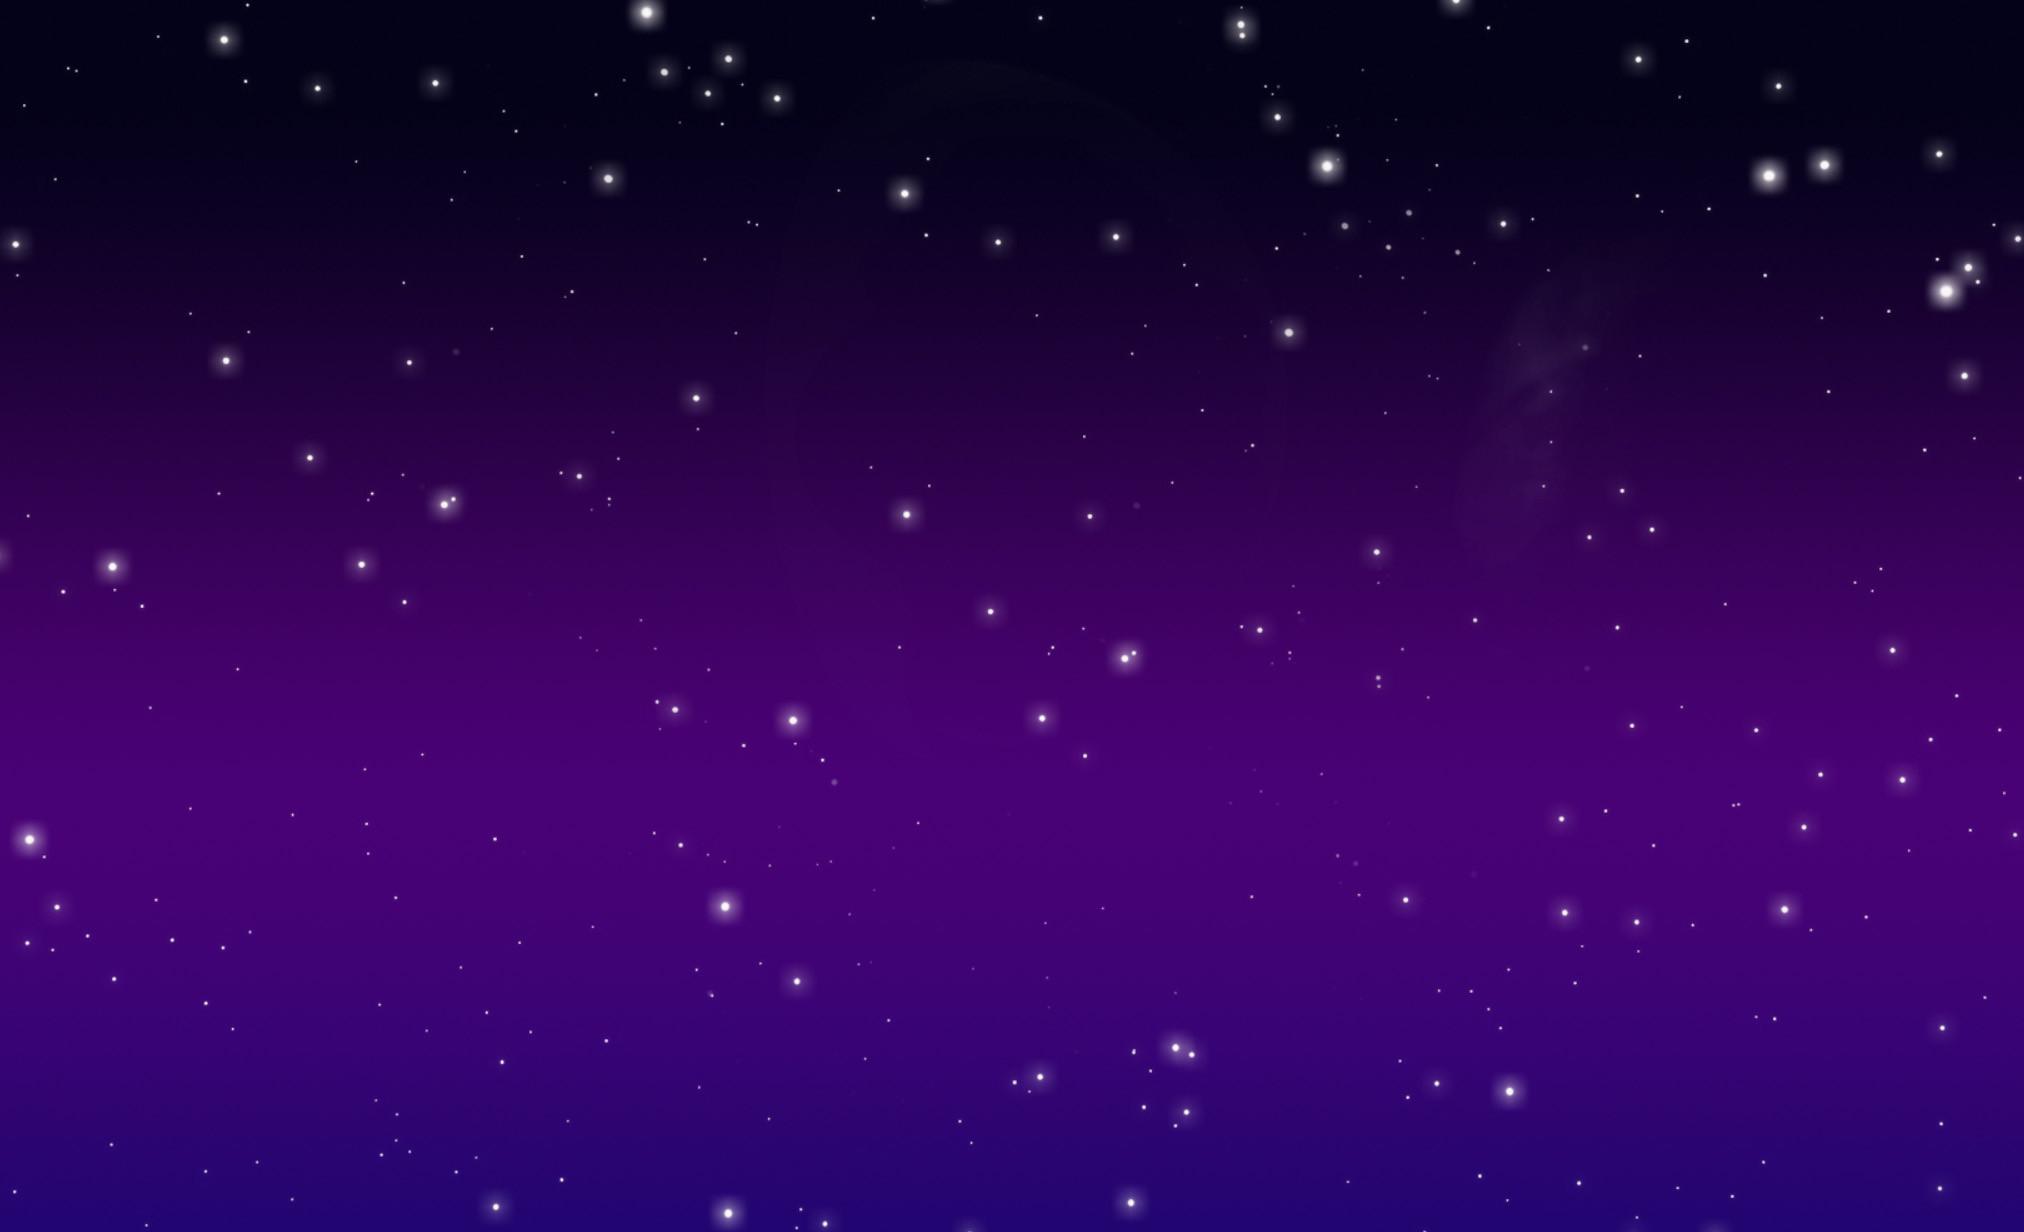 Purple Wallpaper 112 217386 Purple Star Background Tumblr